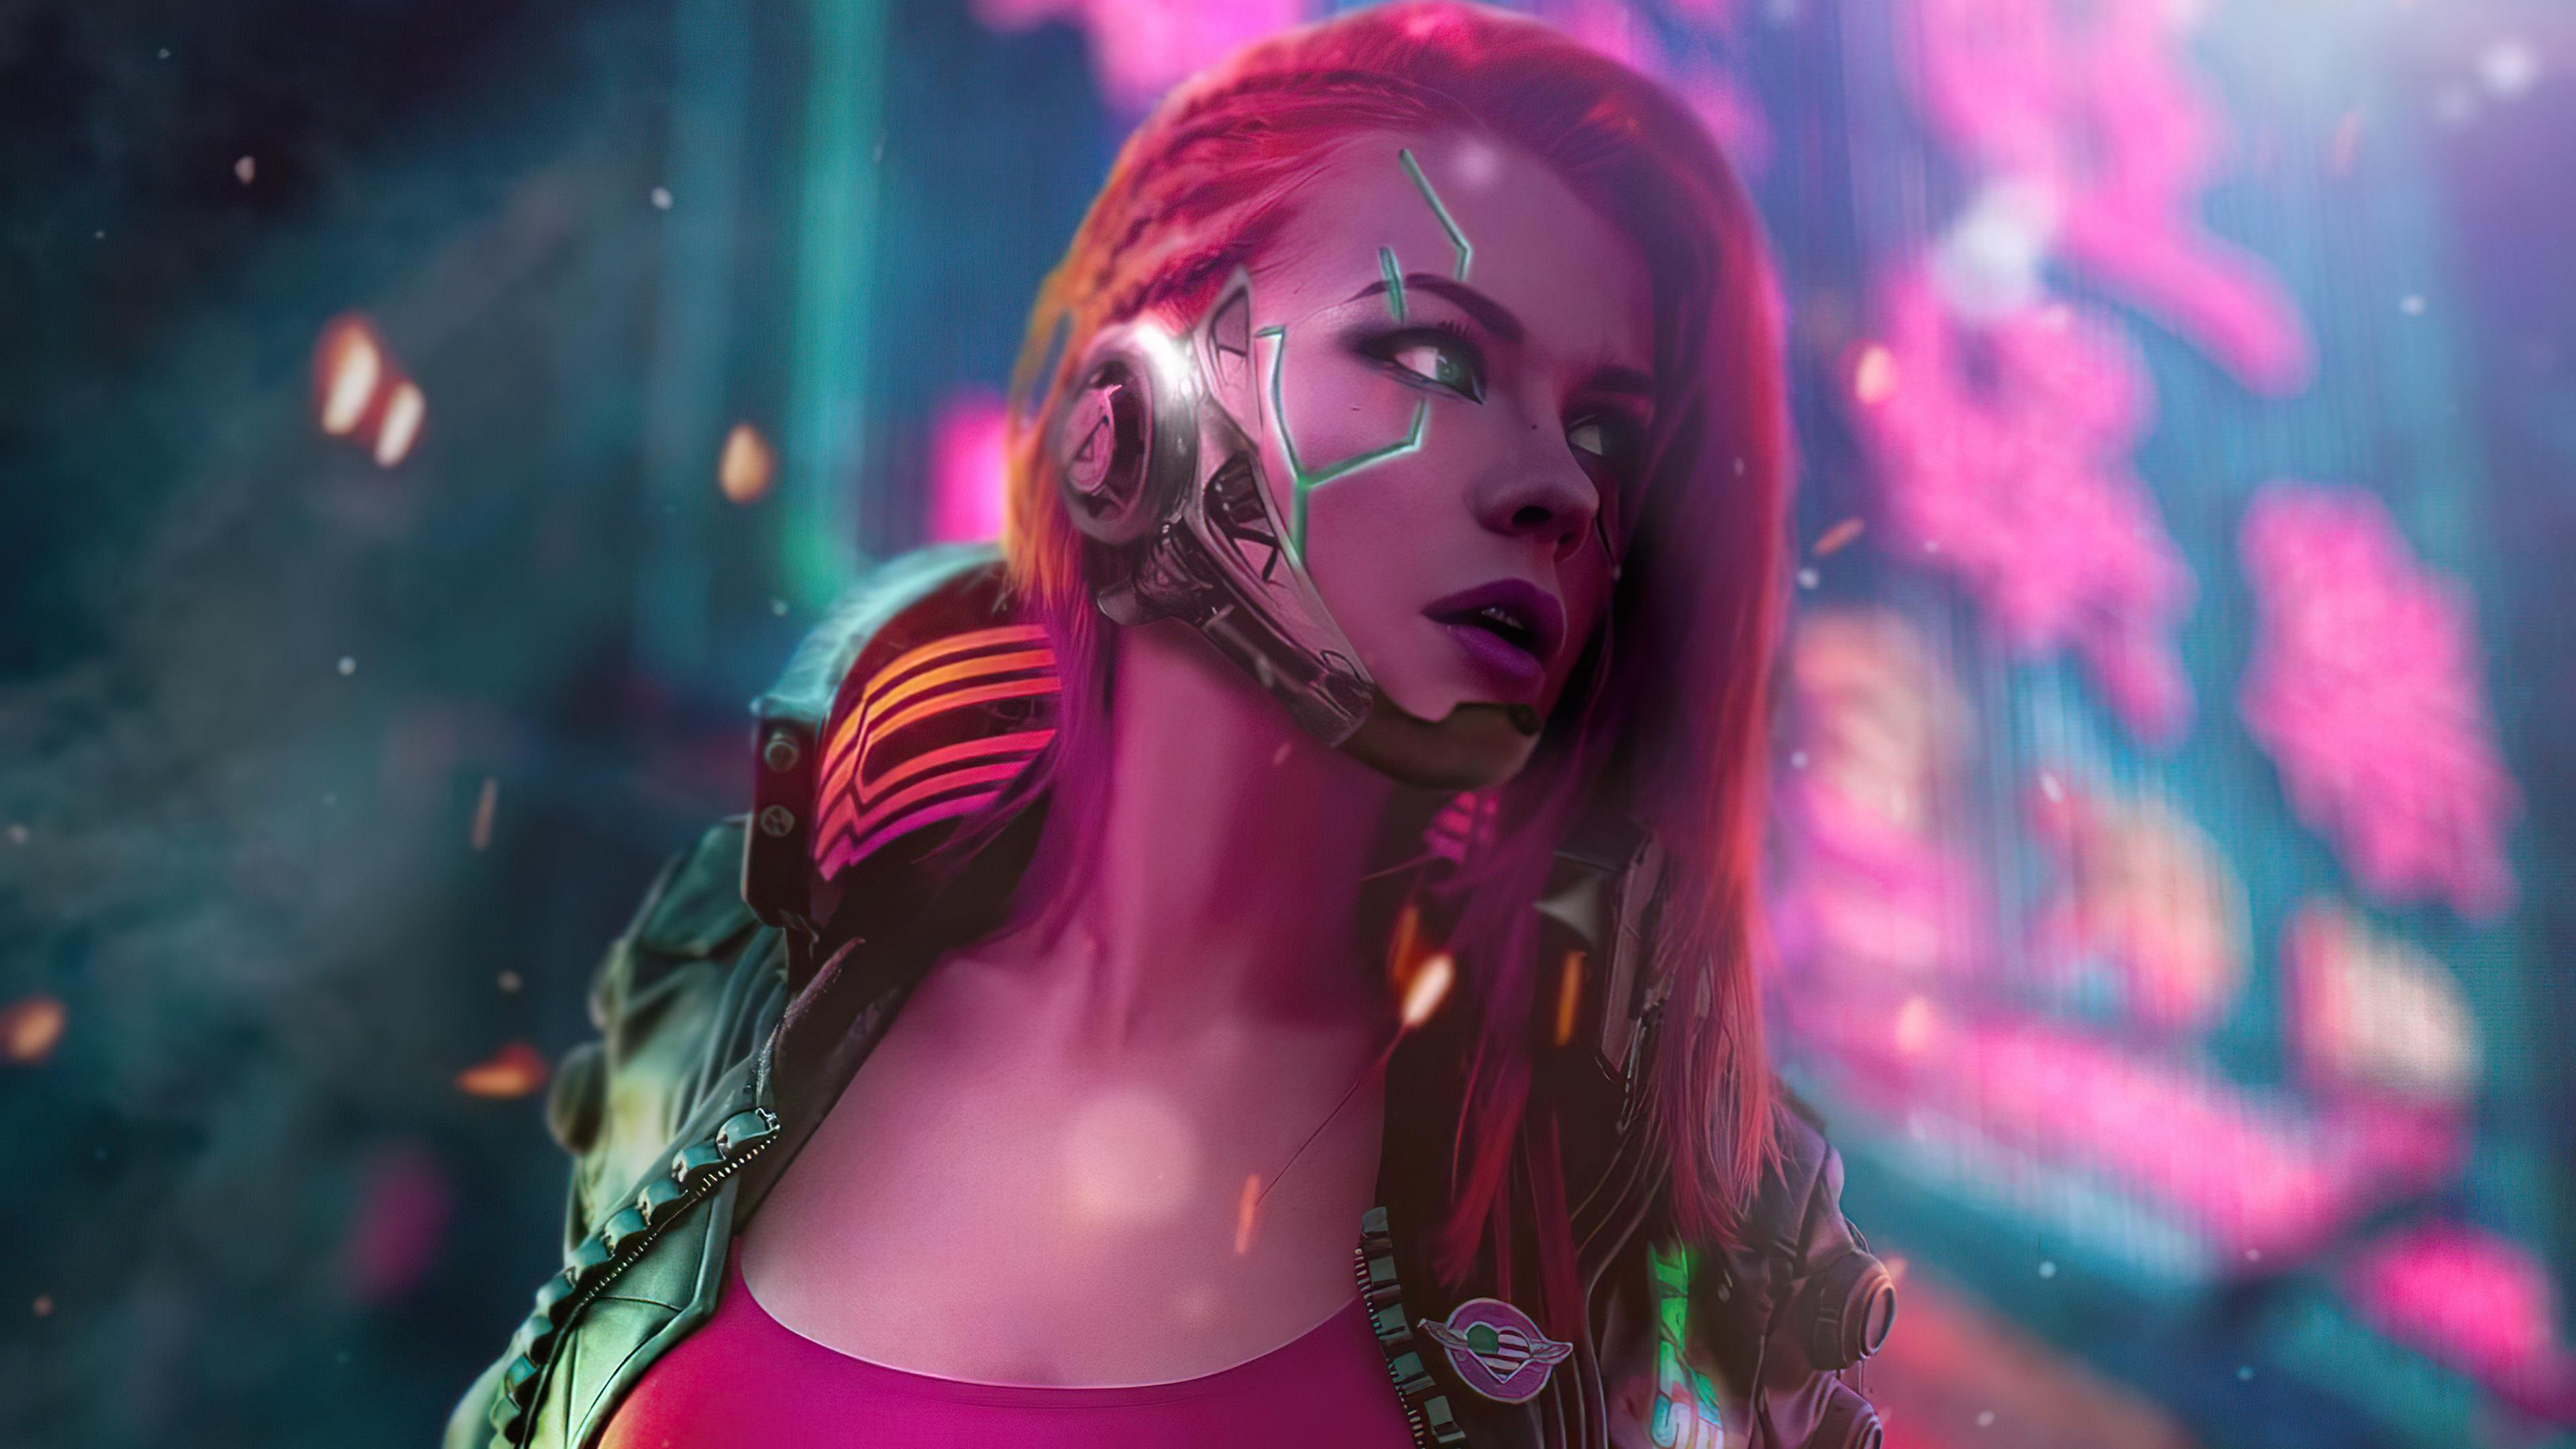 cyberpunk scifi girl 4k 1618133345 - Cyberpunk Scifi Girl 4k - Cyberpunk Scifi Girl 4k wallpapers